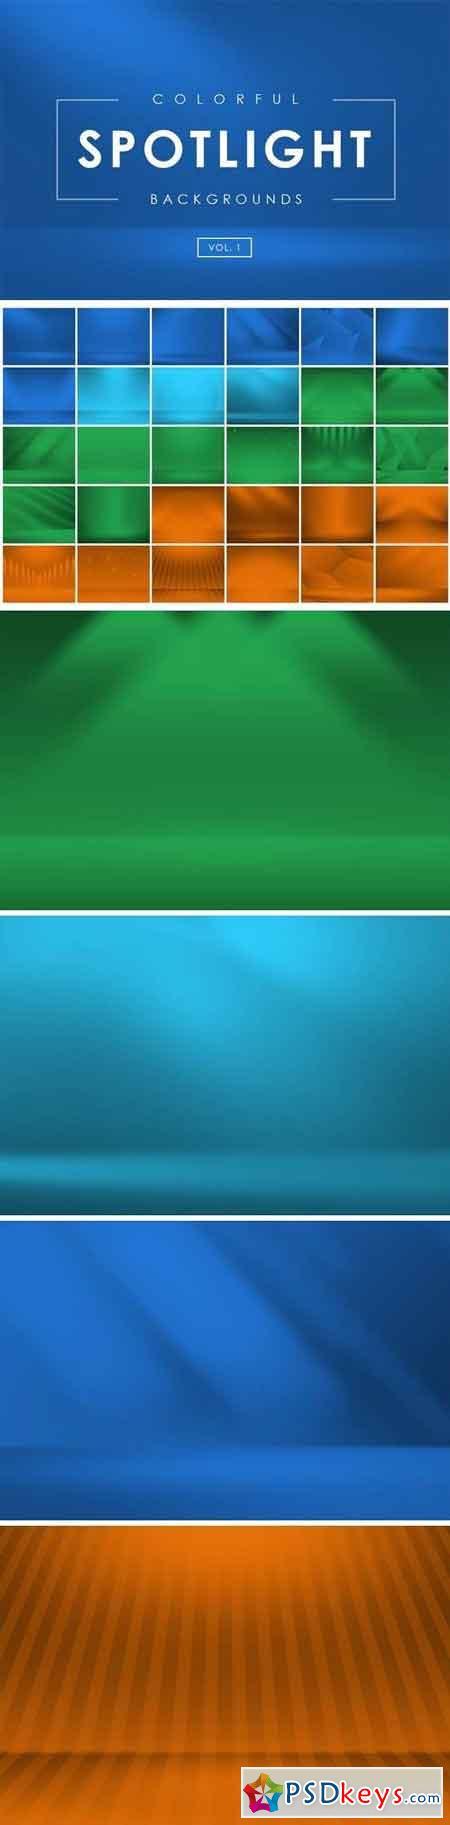 Colorful Spotlight Backgrounds Vol 1